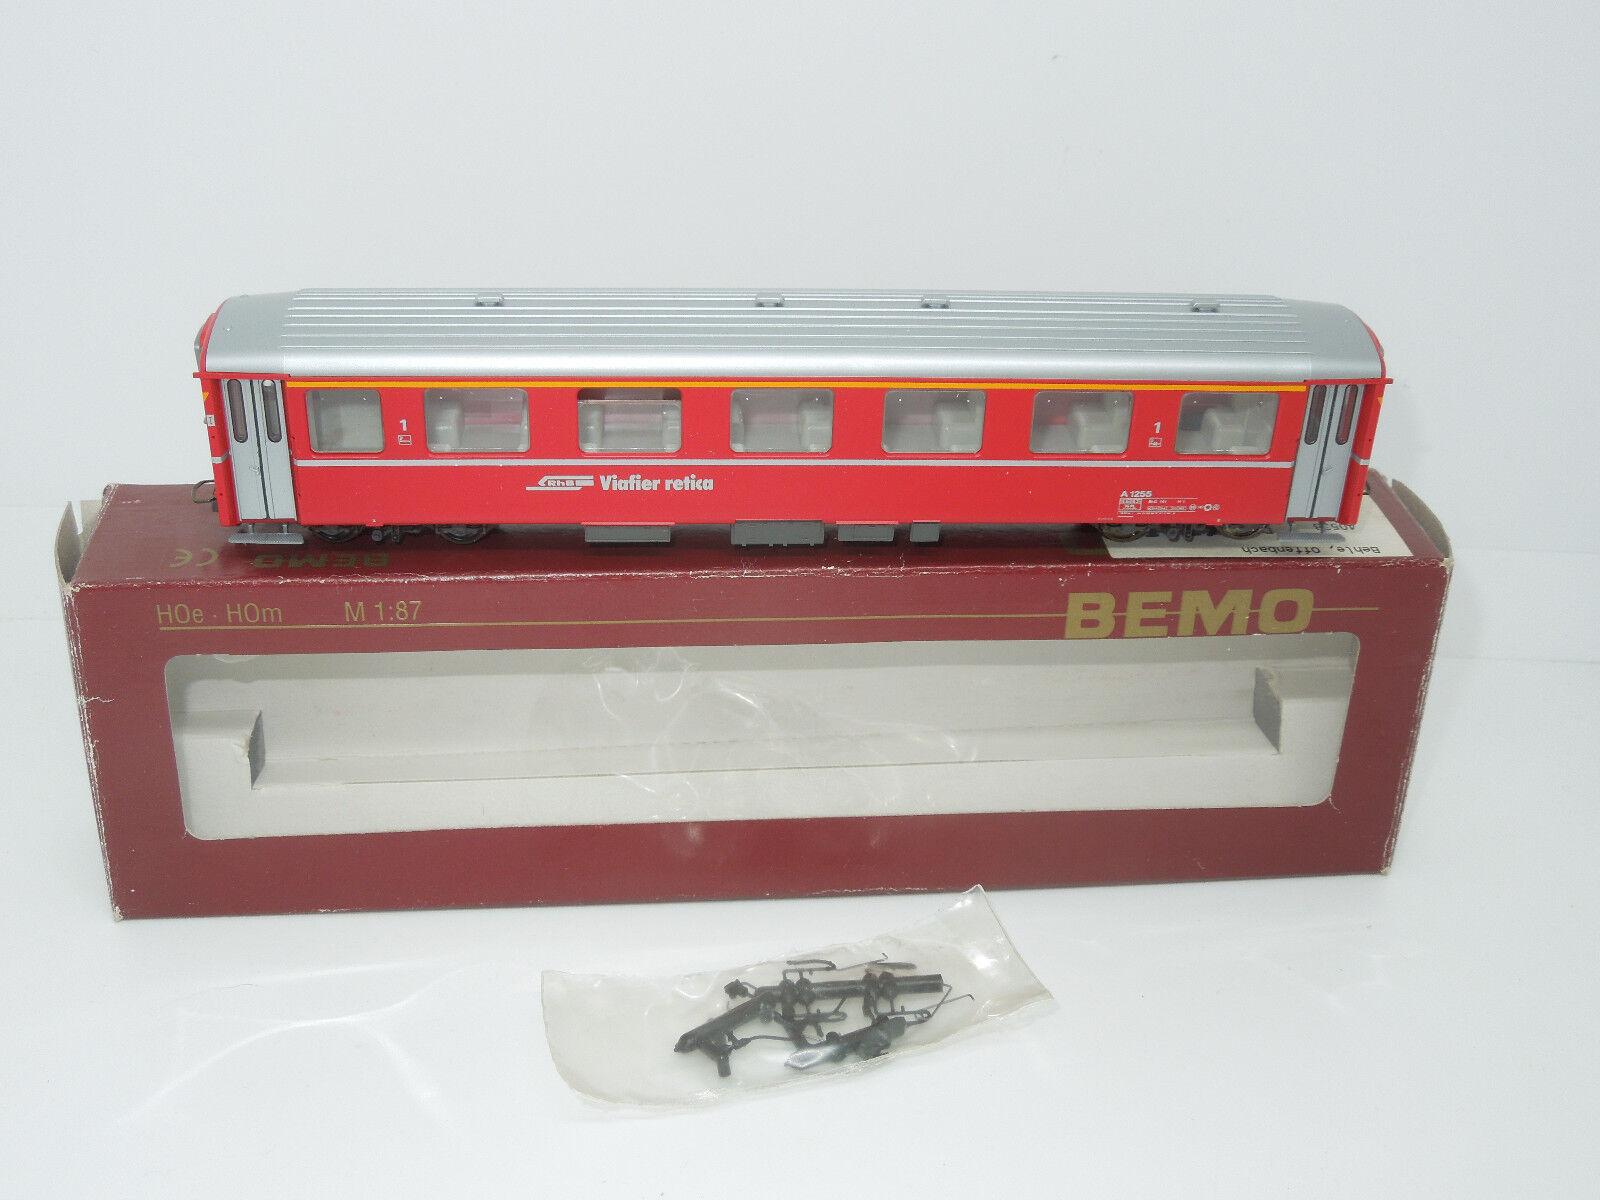 Bemo H0e 3268135 Personenwagen 1. Kl RhB Rhätische Bahn